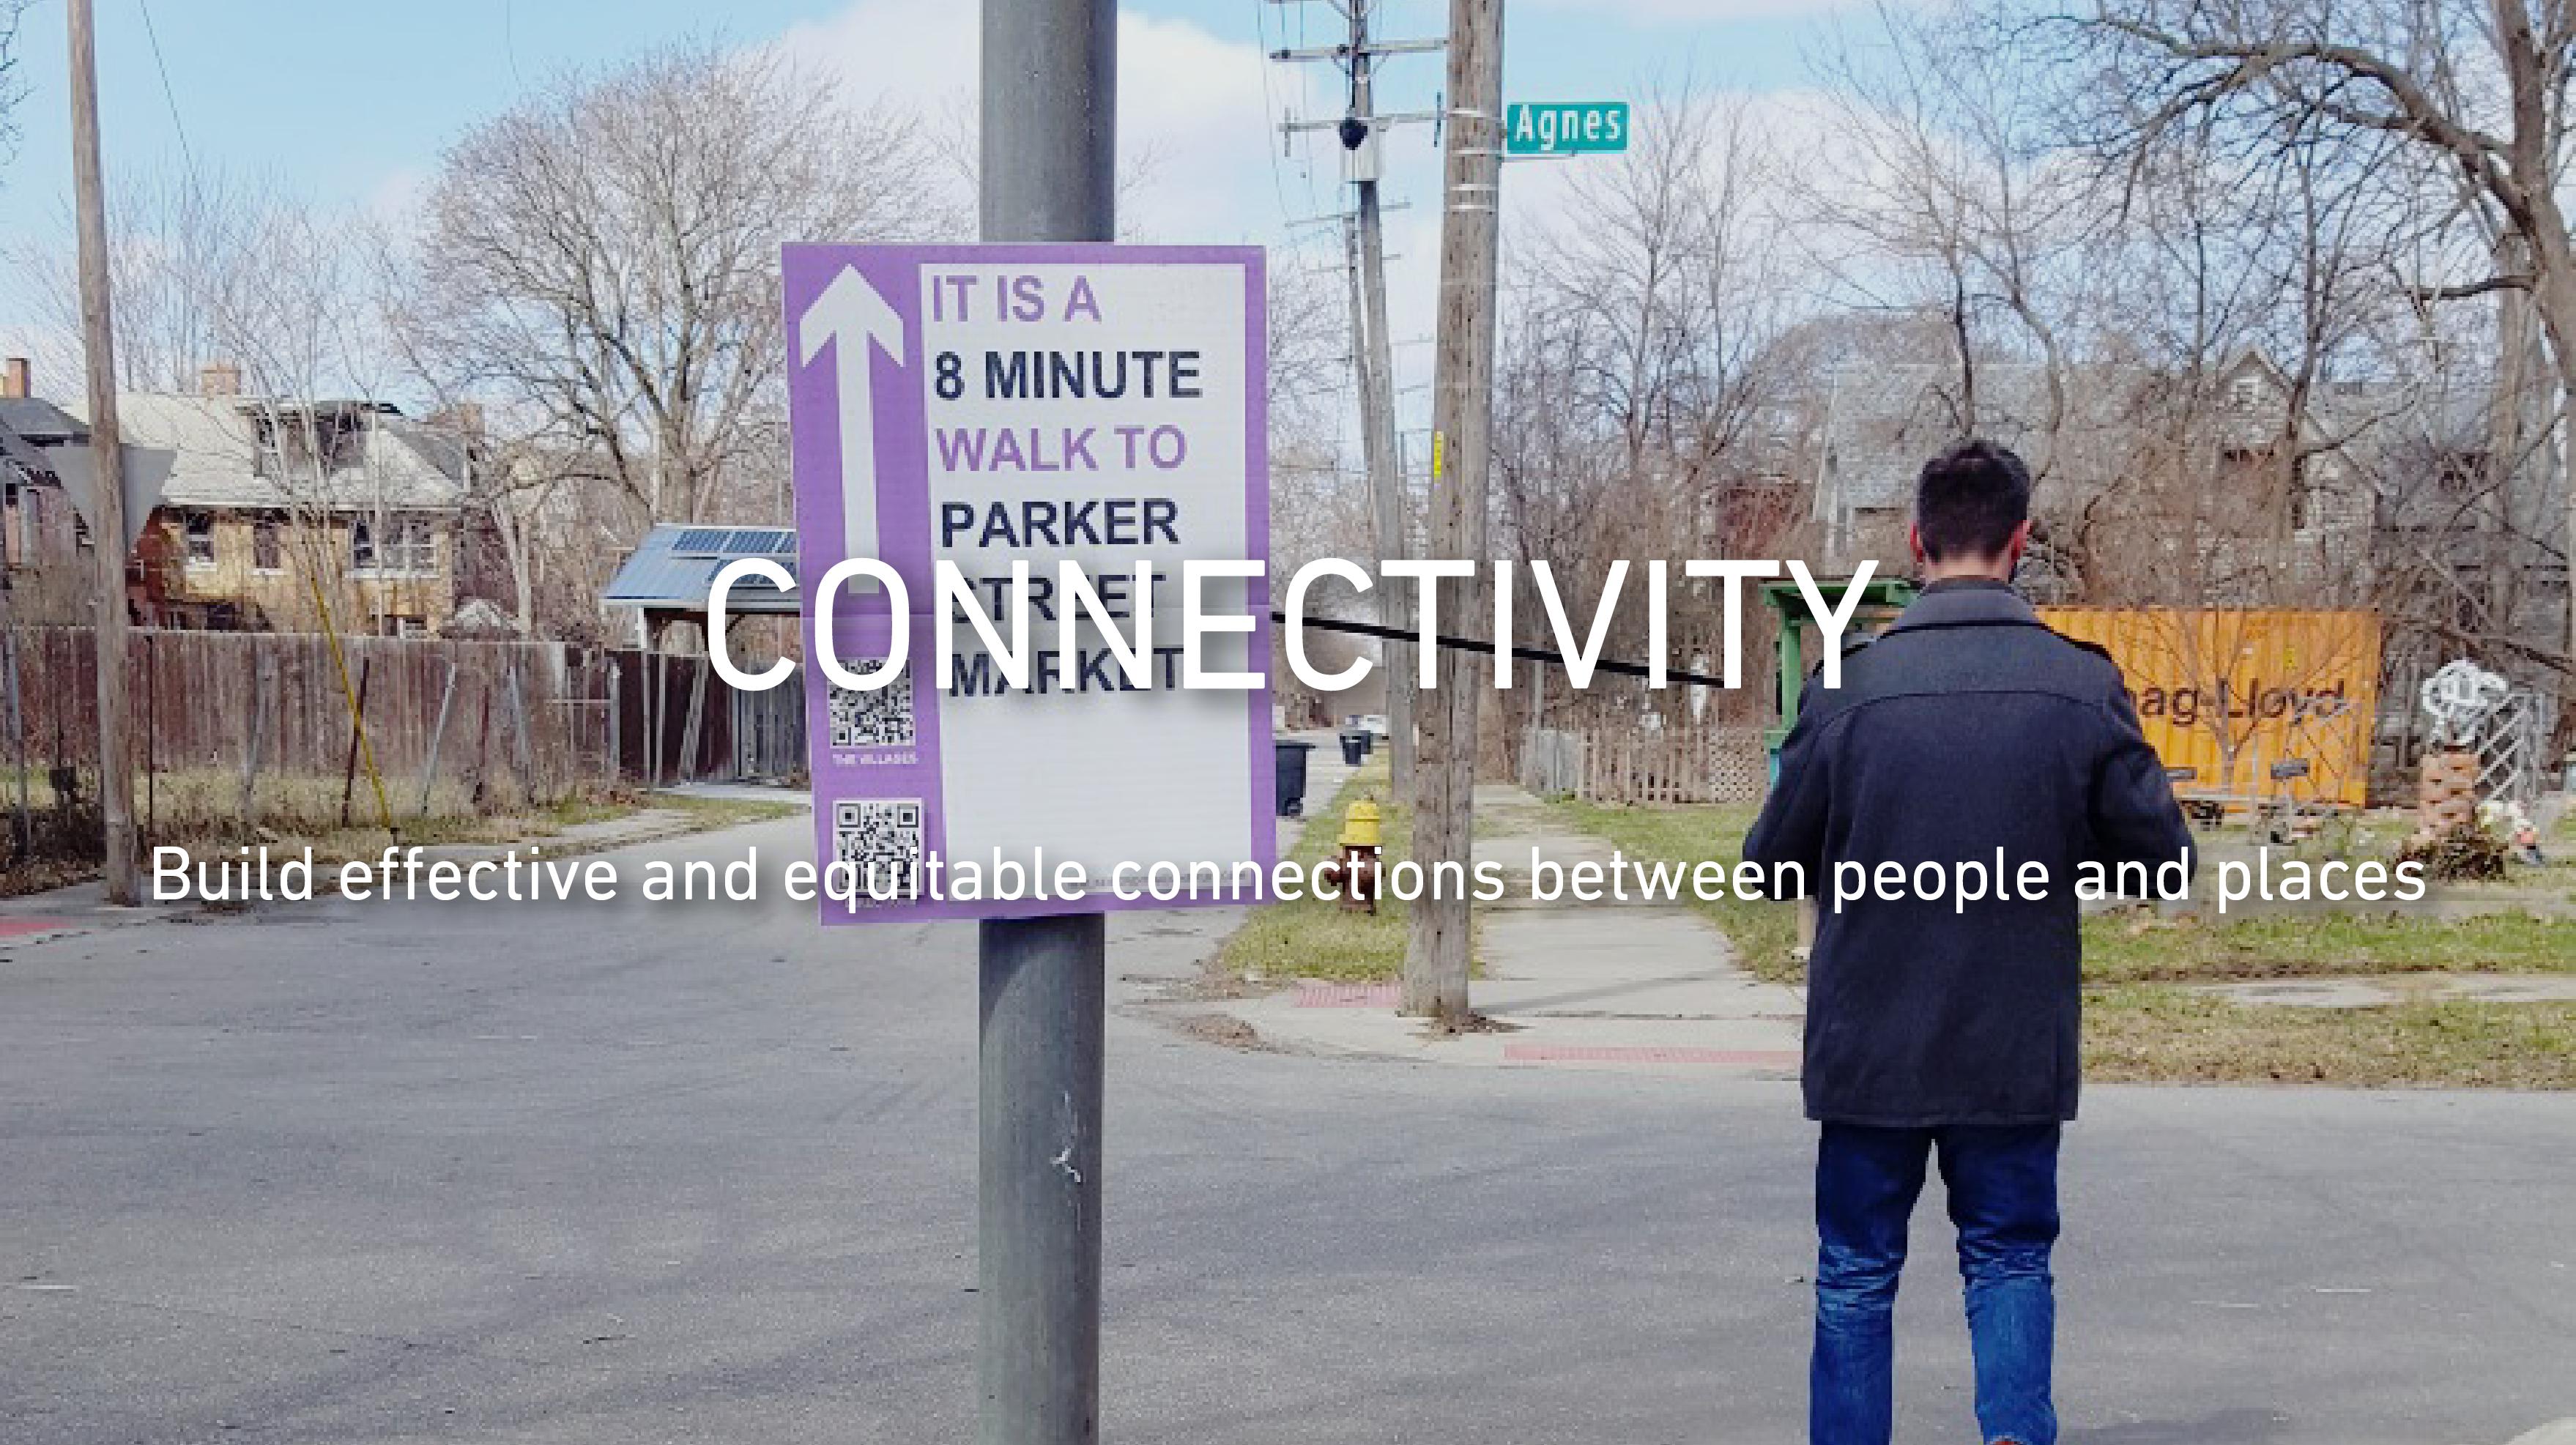 Connectivity-04